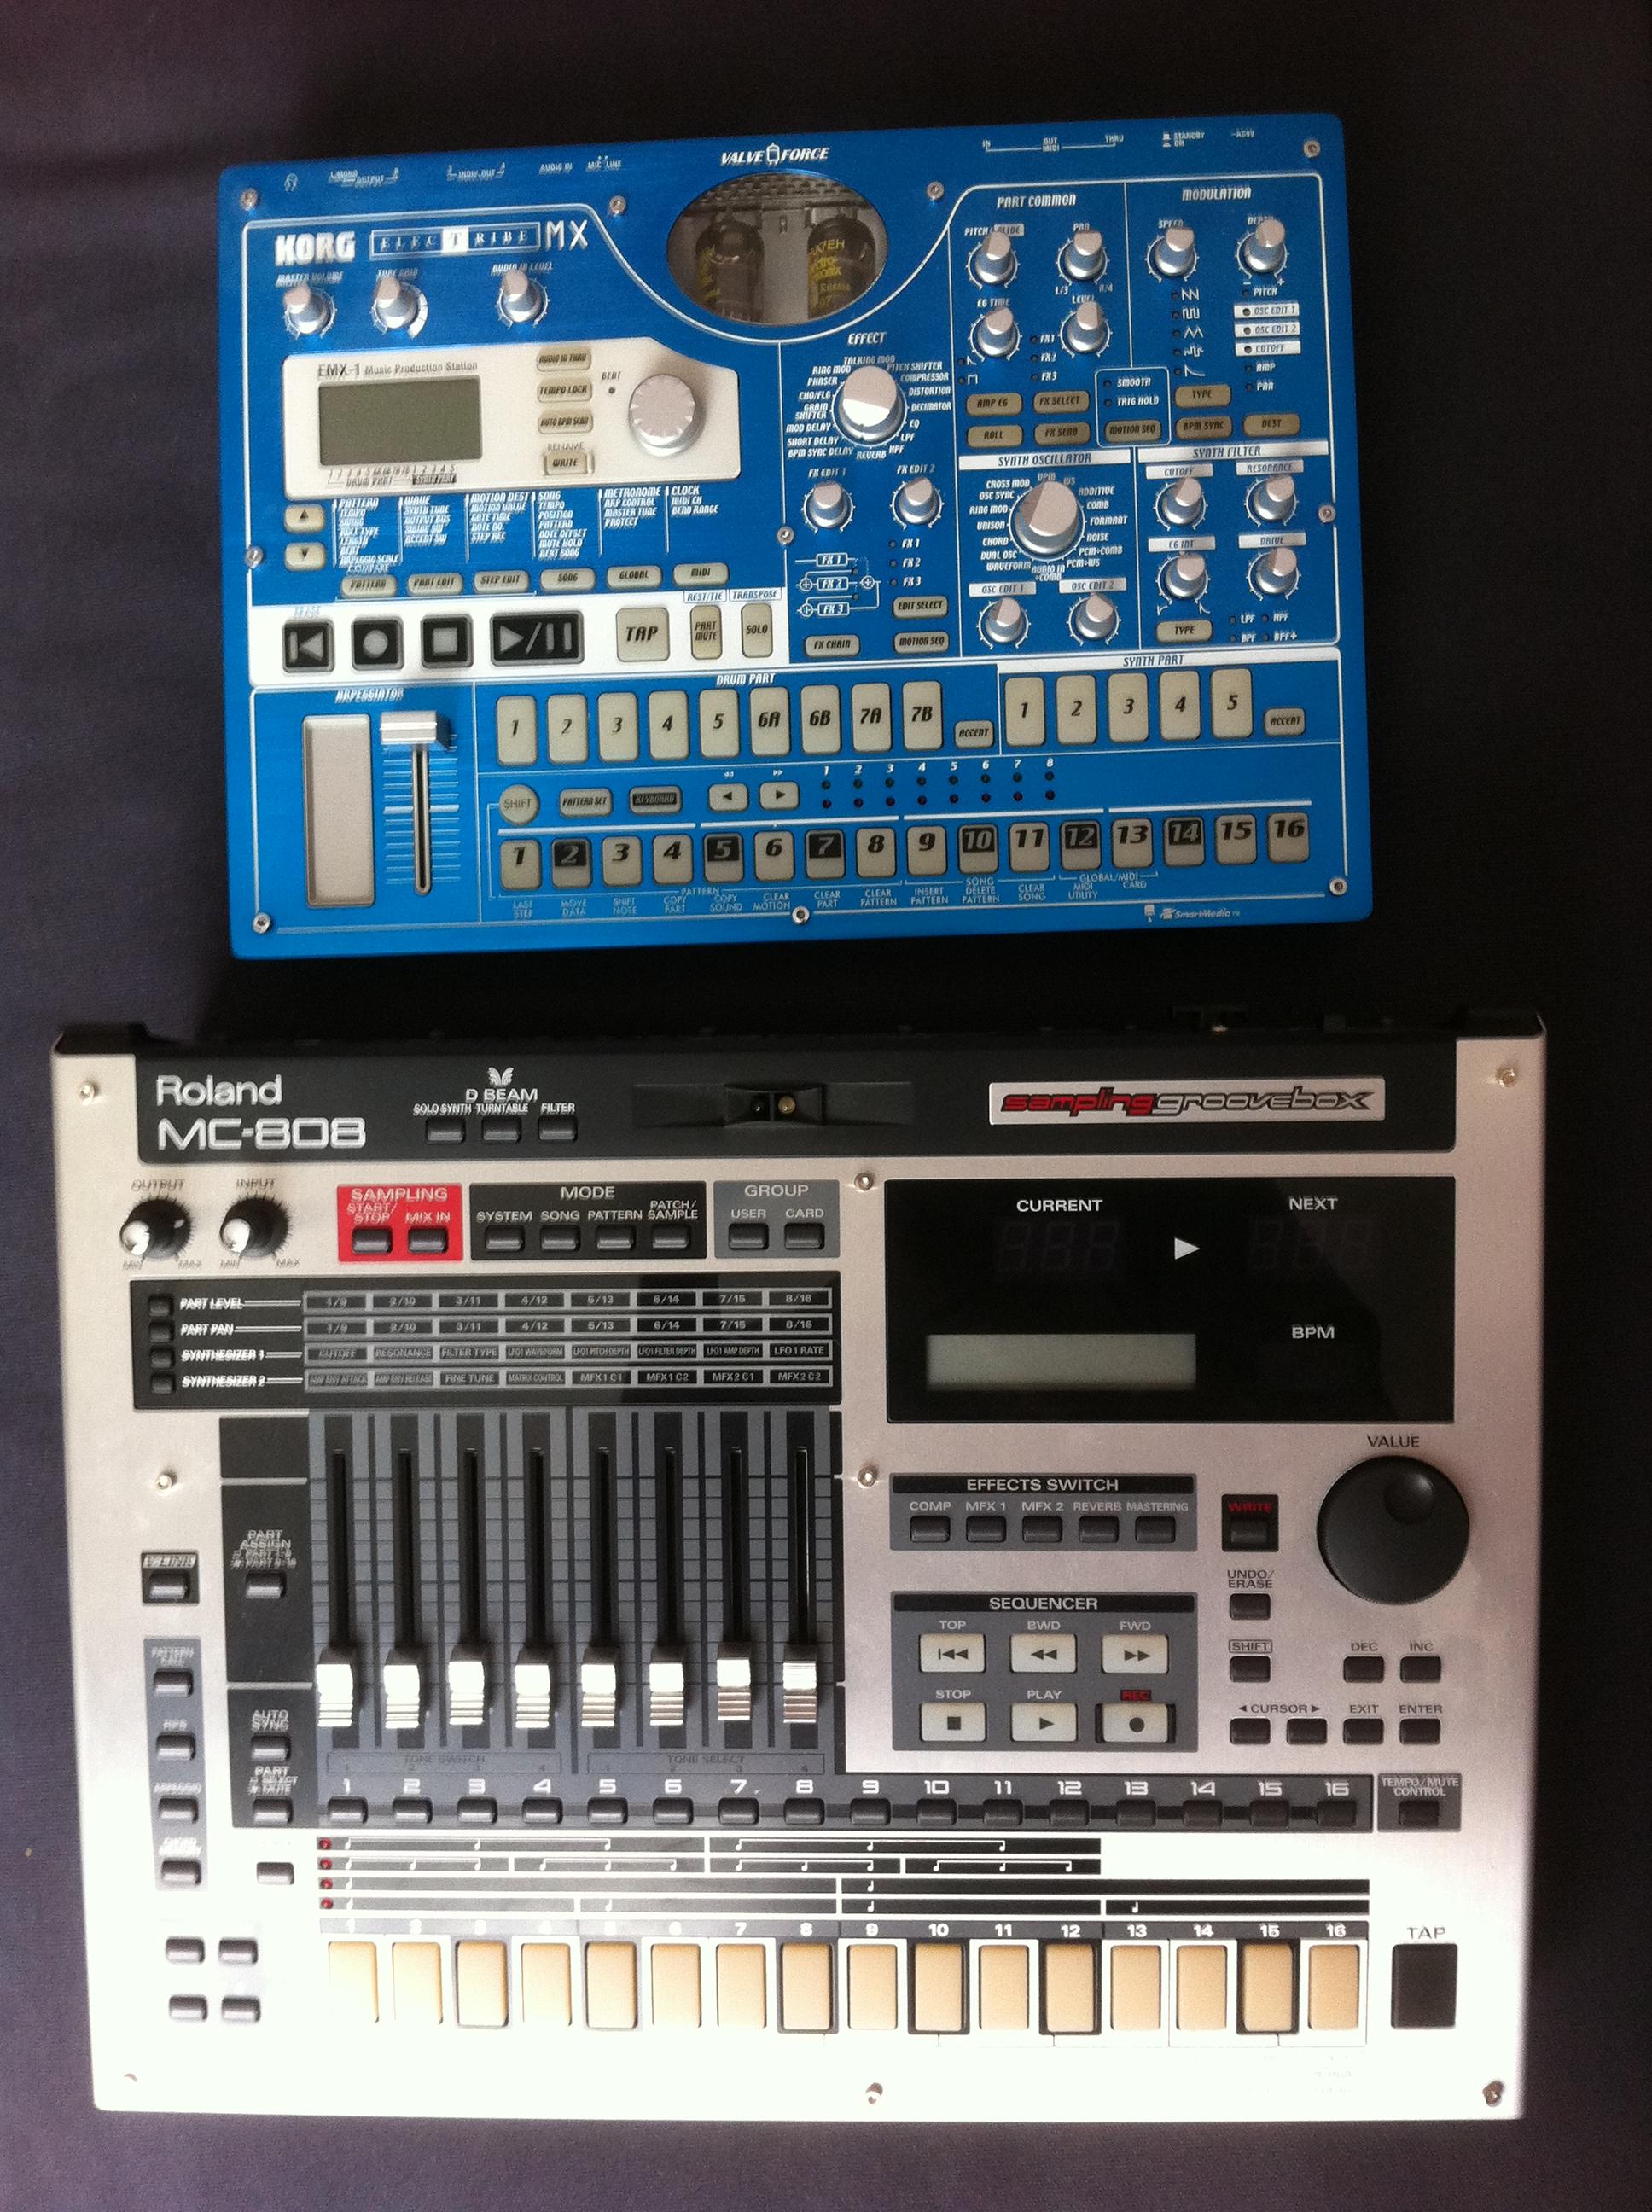 Roland MC-808 image (#424540) - Audiofanzine